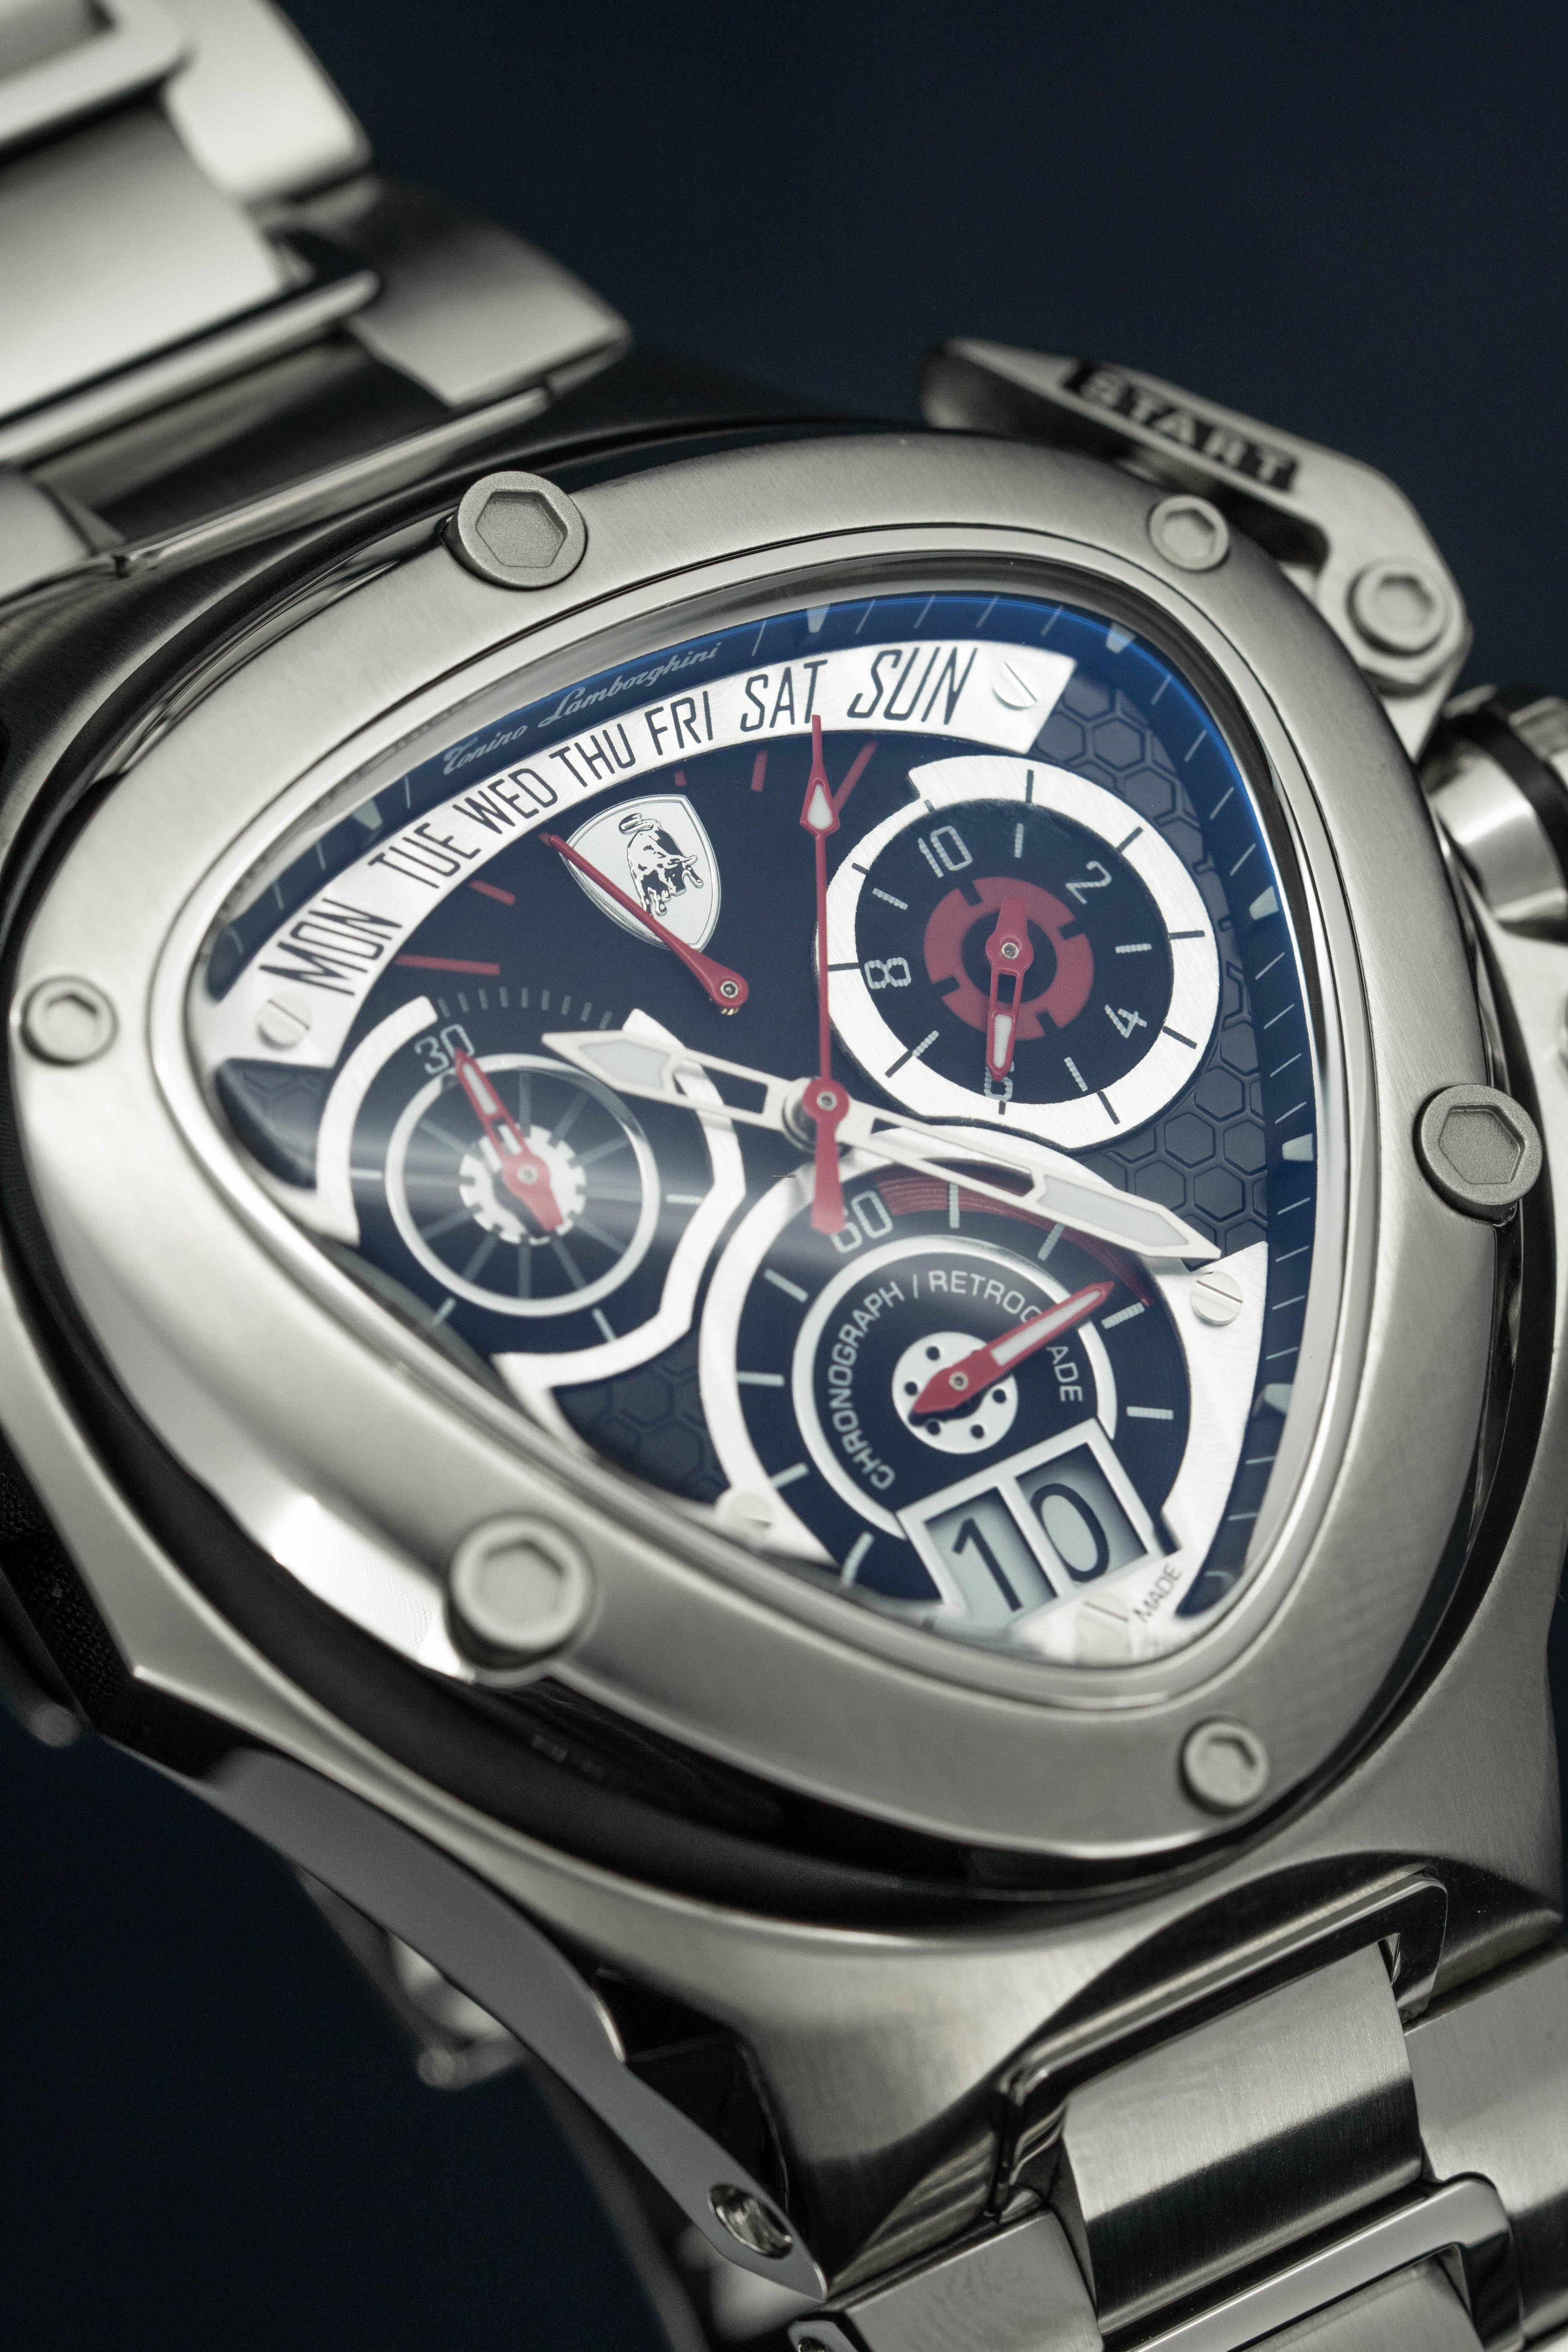 Tonino Lamborghini Chronograph Watch Spyder Stainless Steel